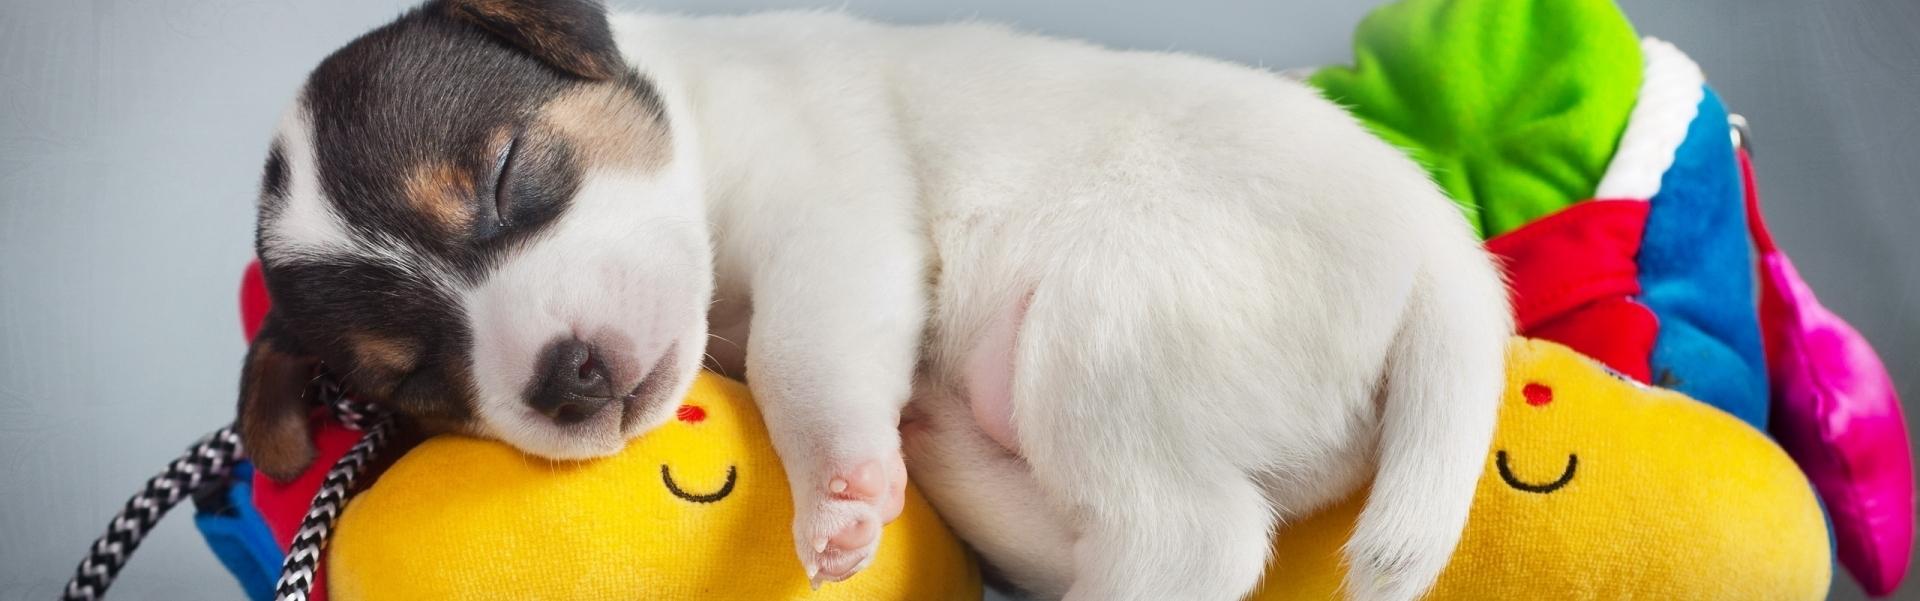 Cățelușii dorm